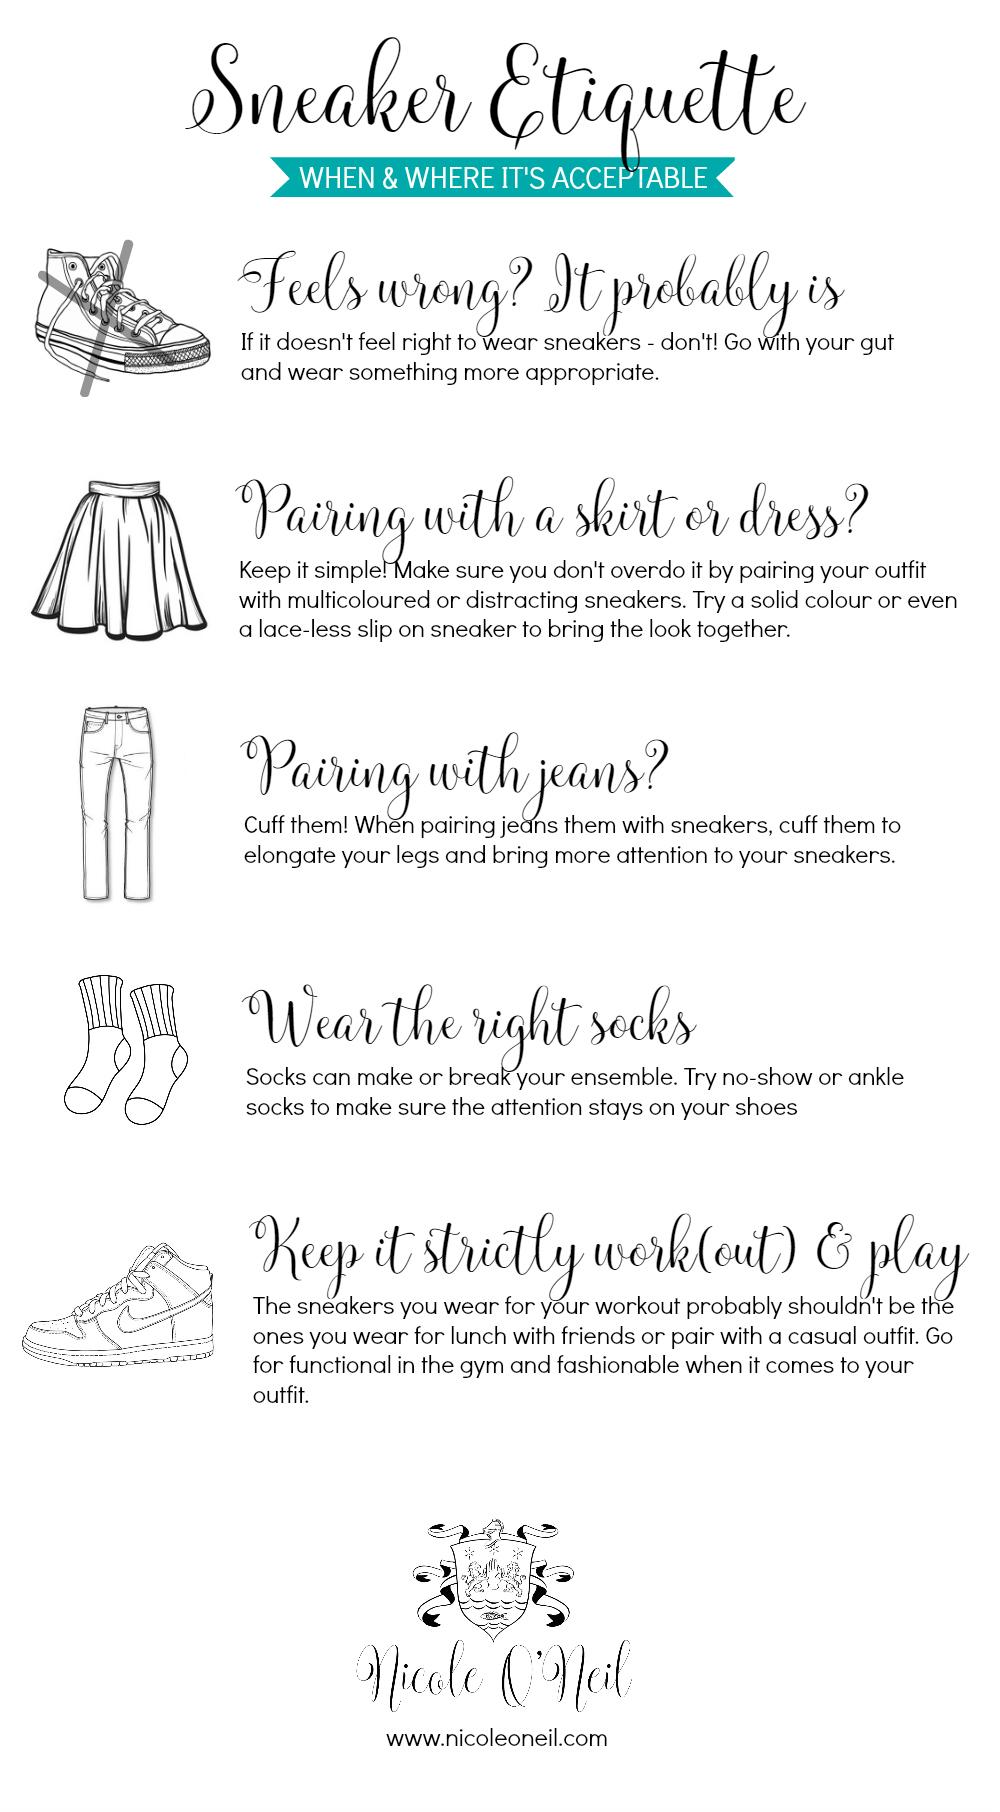 Sneaker Etiquette.jpg